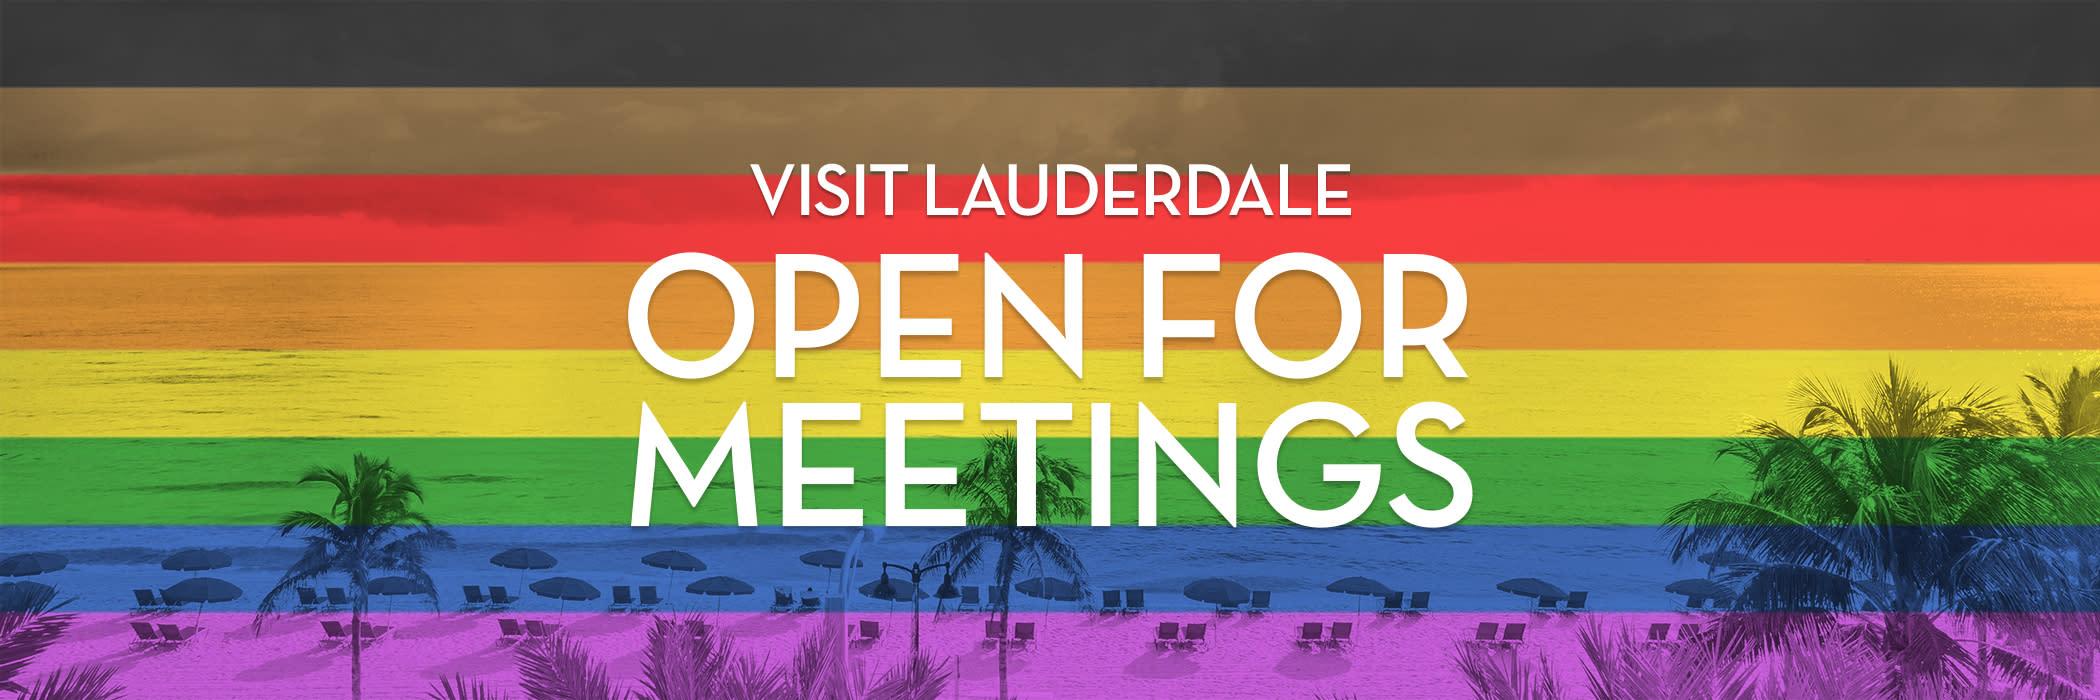 Visit Lauderdale Open for Meetings